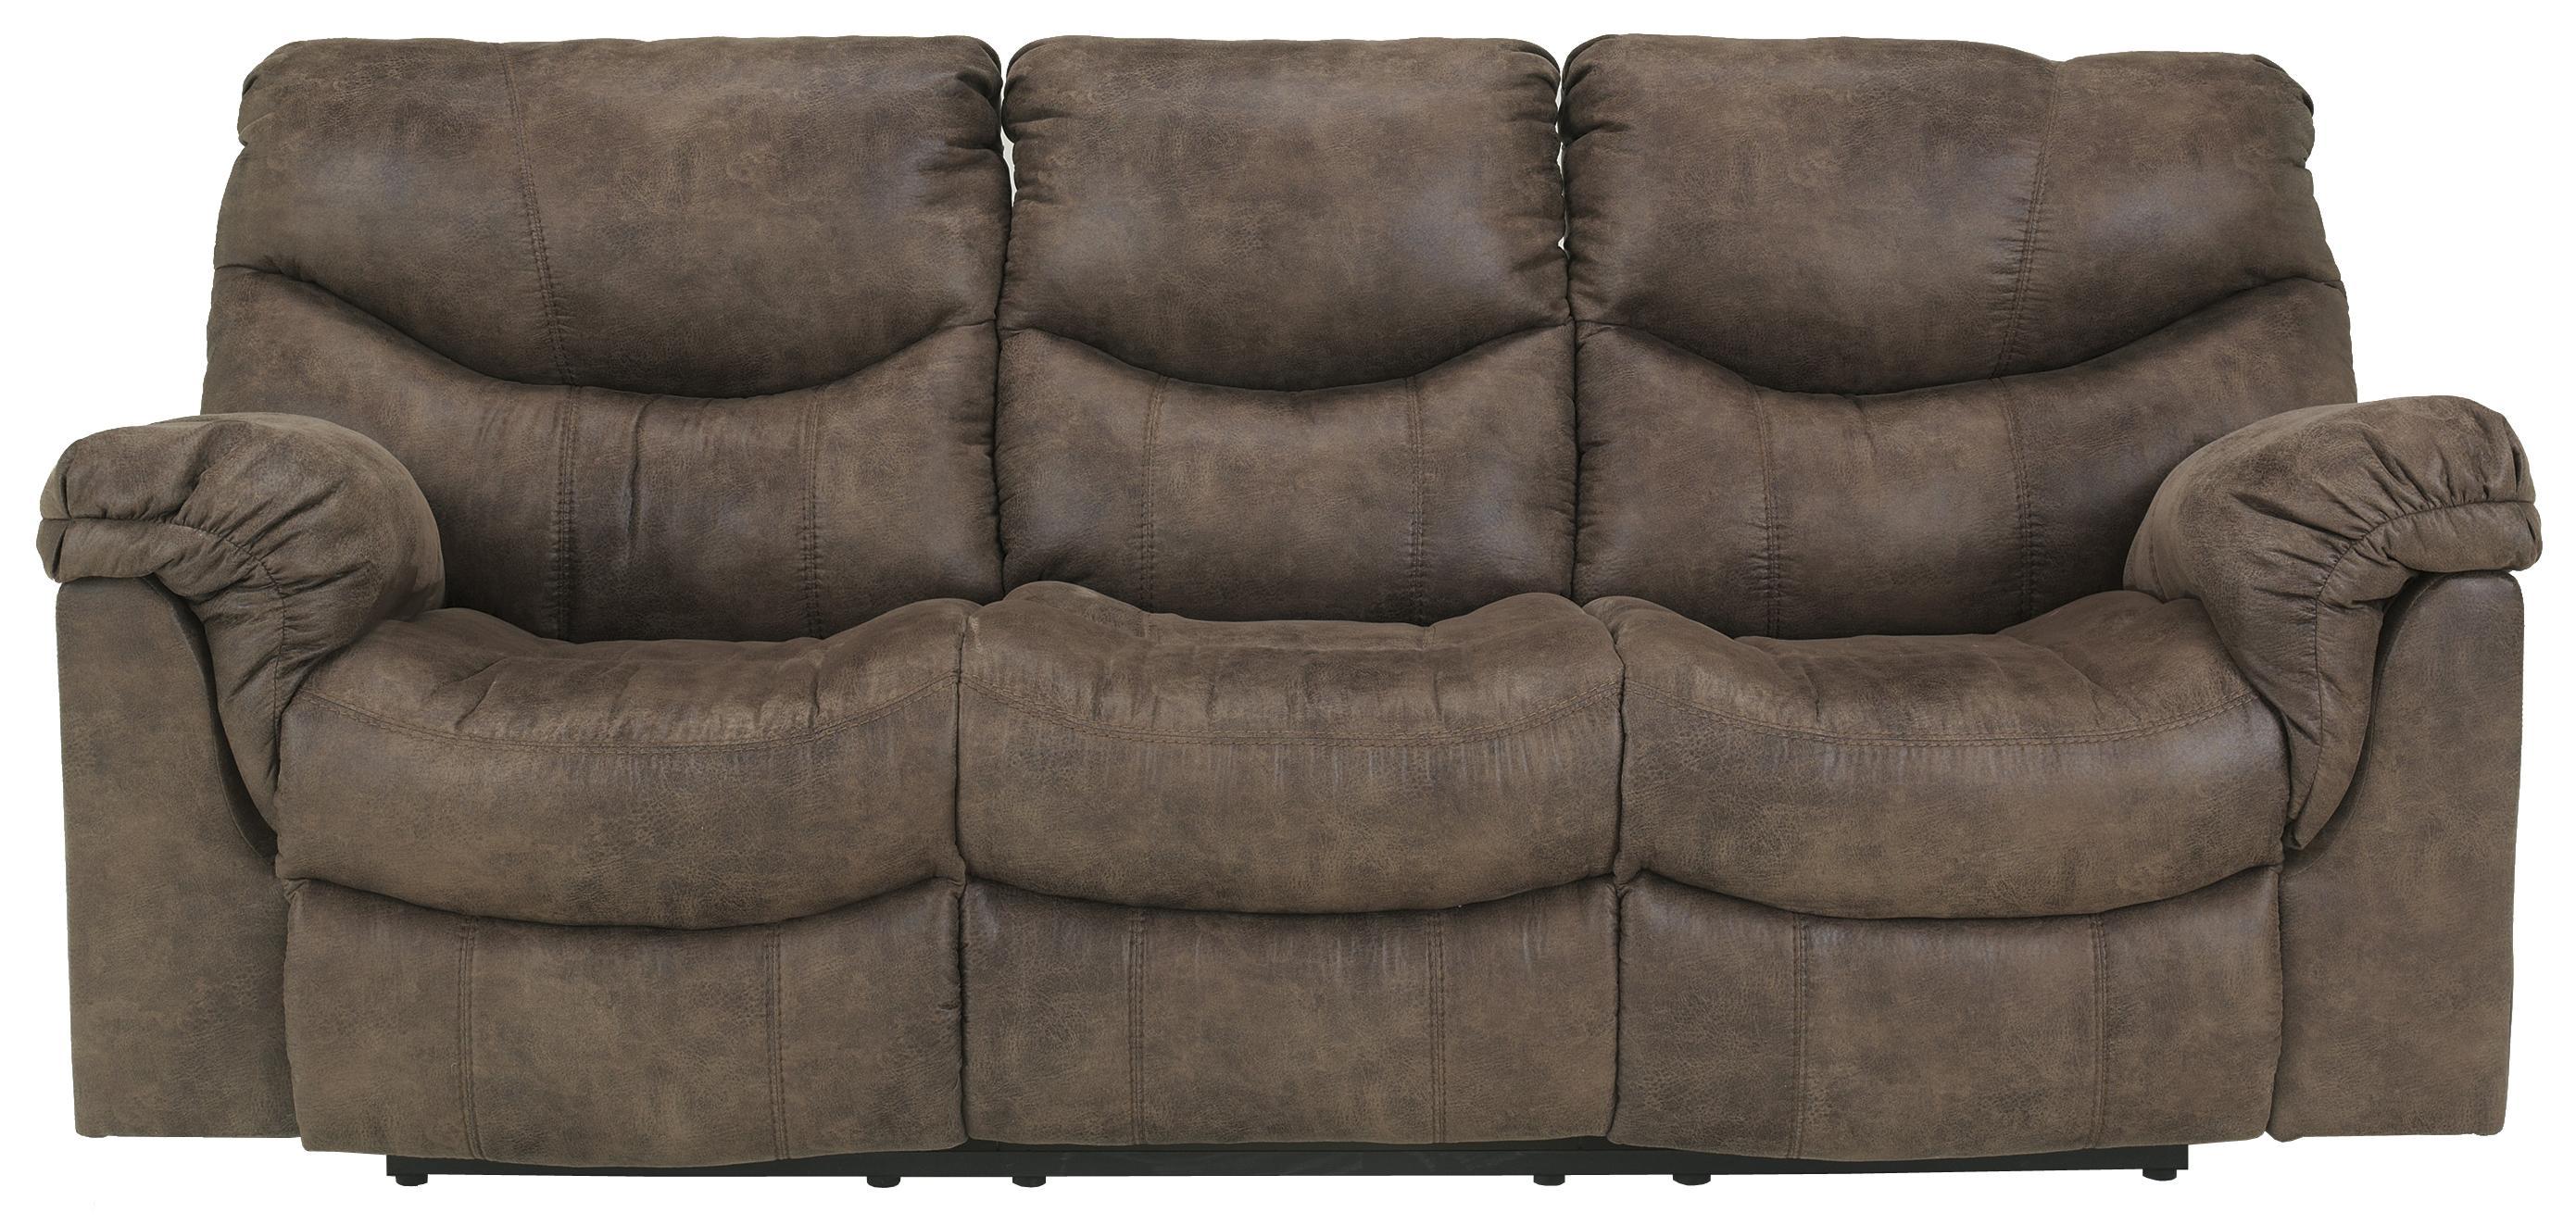 Alzena - Gunsmoke Reclining Sofa by Ashley (Signature Design) at Johnny Janosik